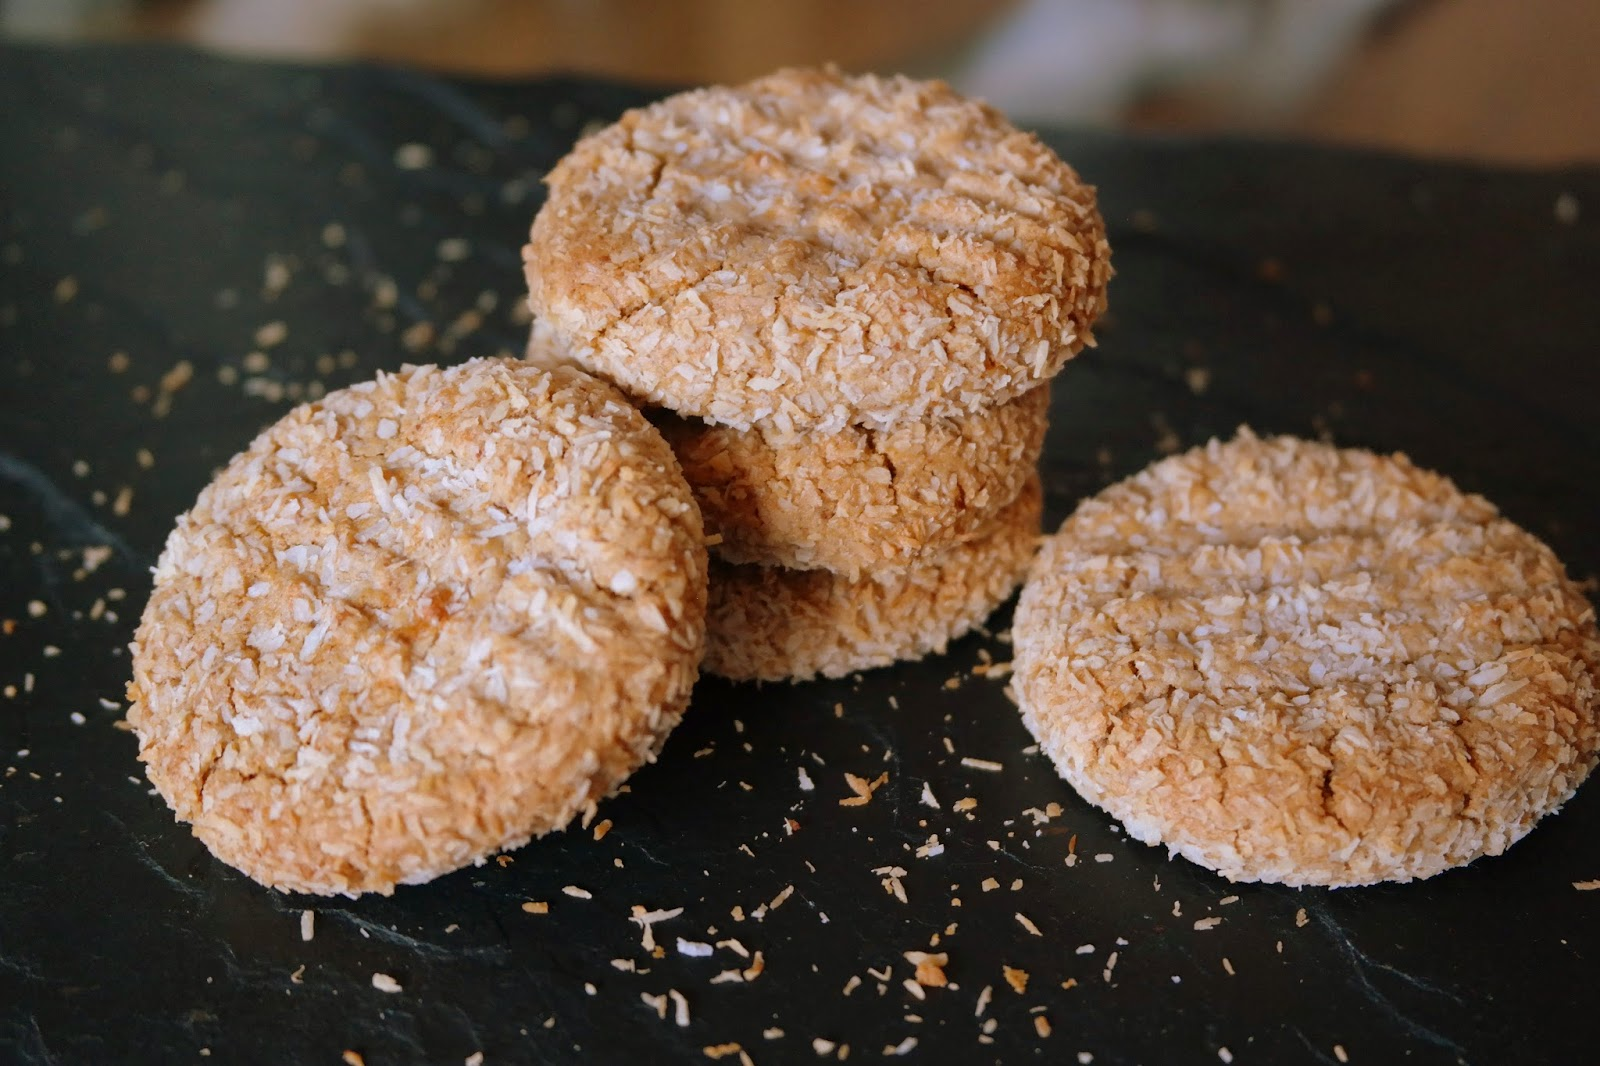 Baking Bar: Guilt Free Peanut Butter Coconut Cookies